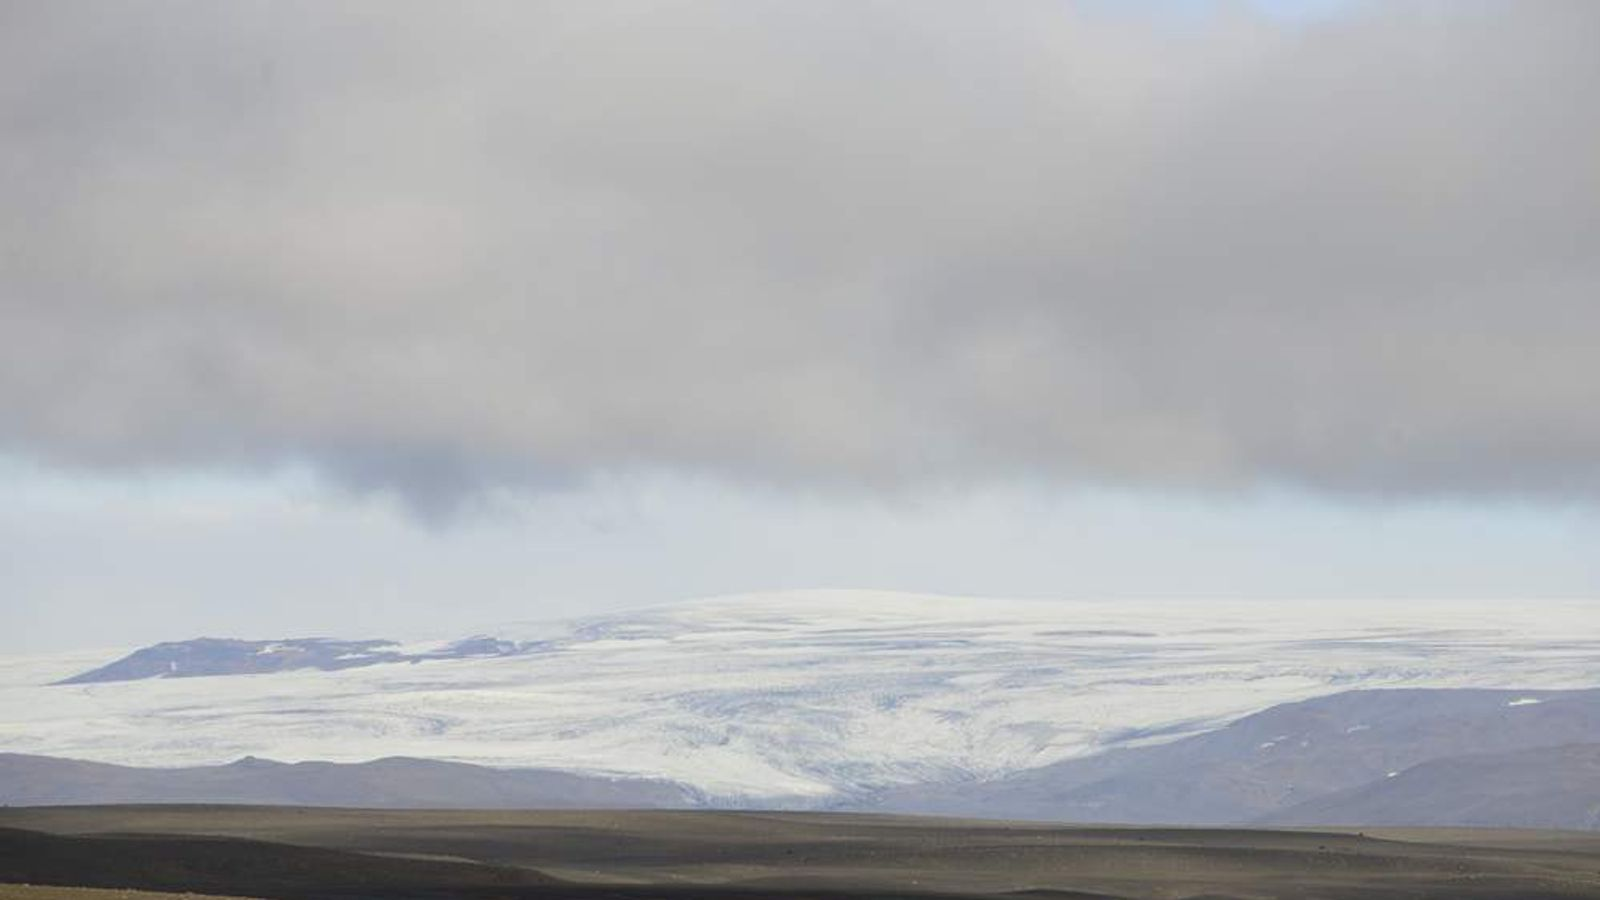 General view of the Hofsjokull glacier